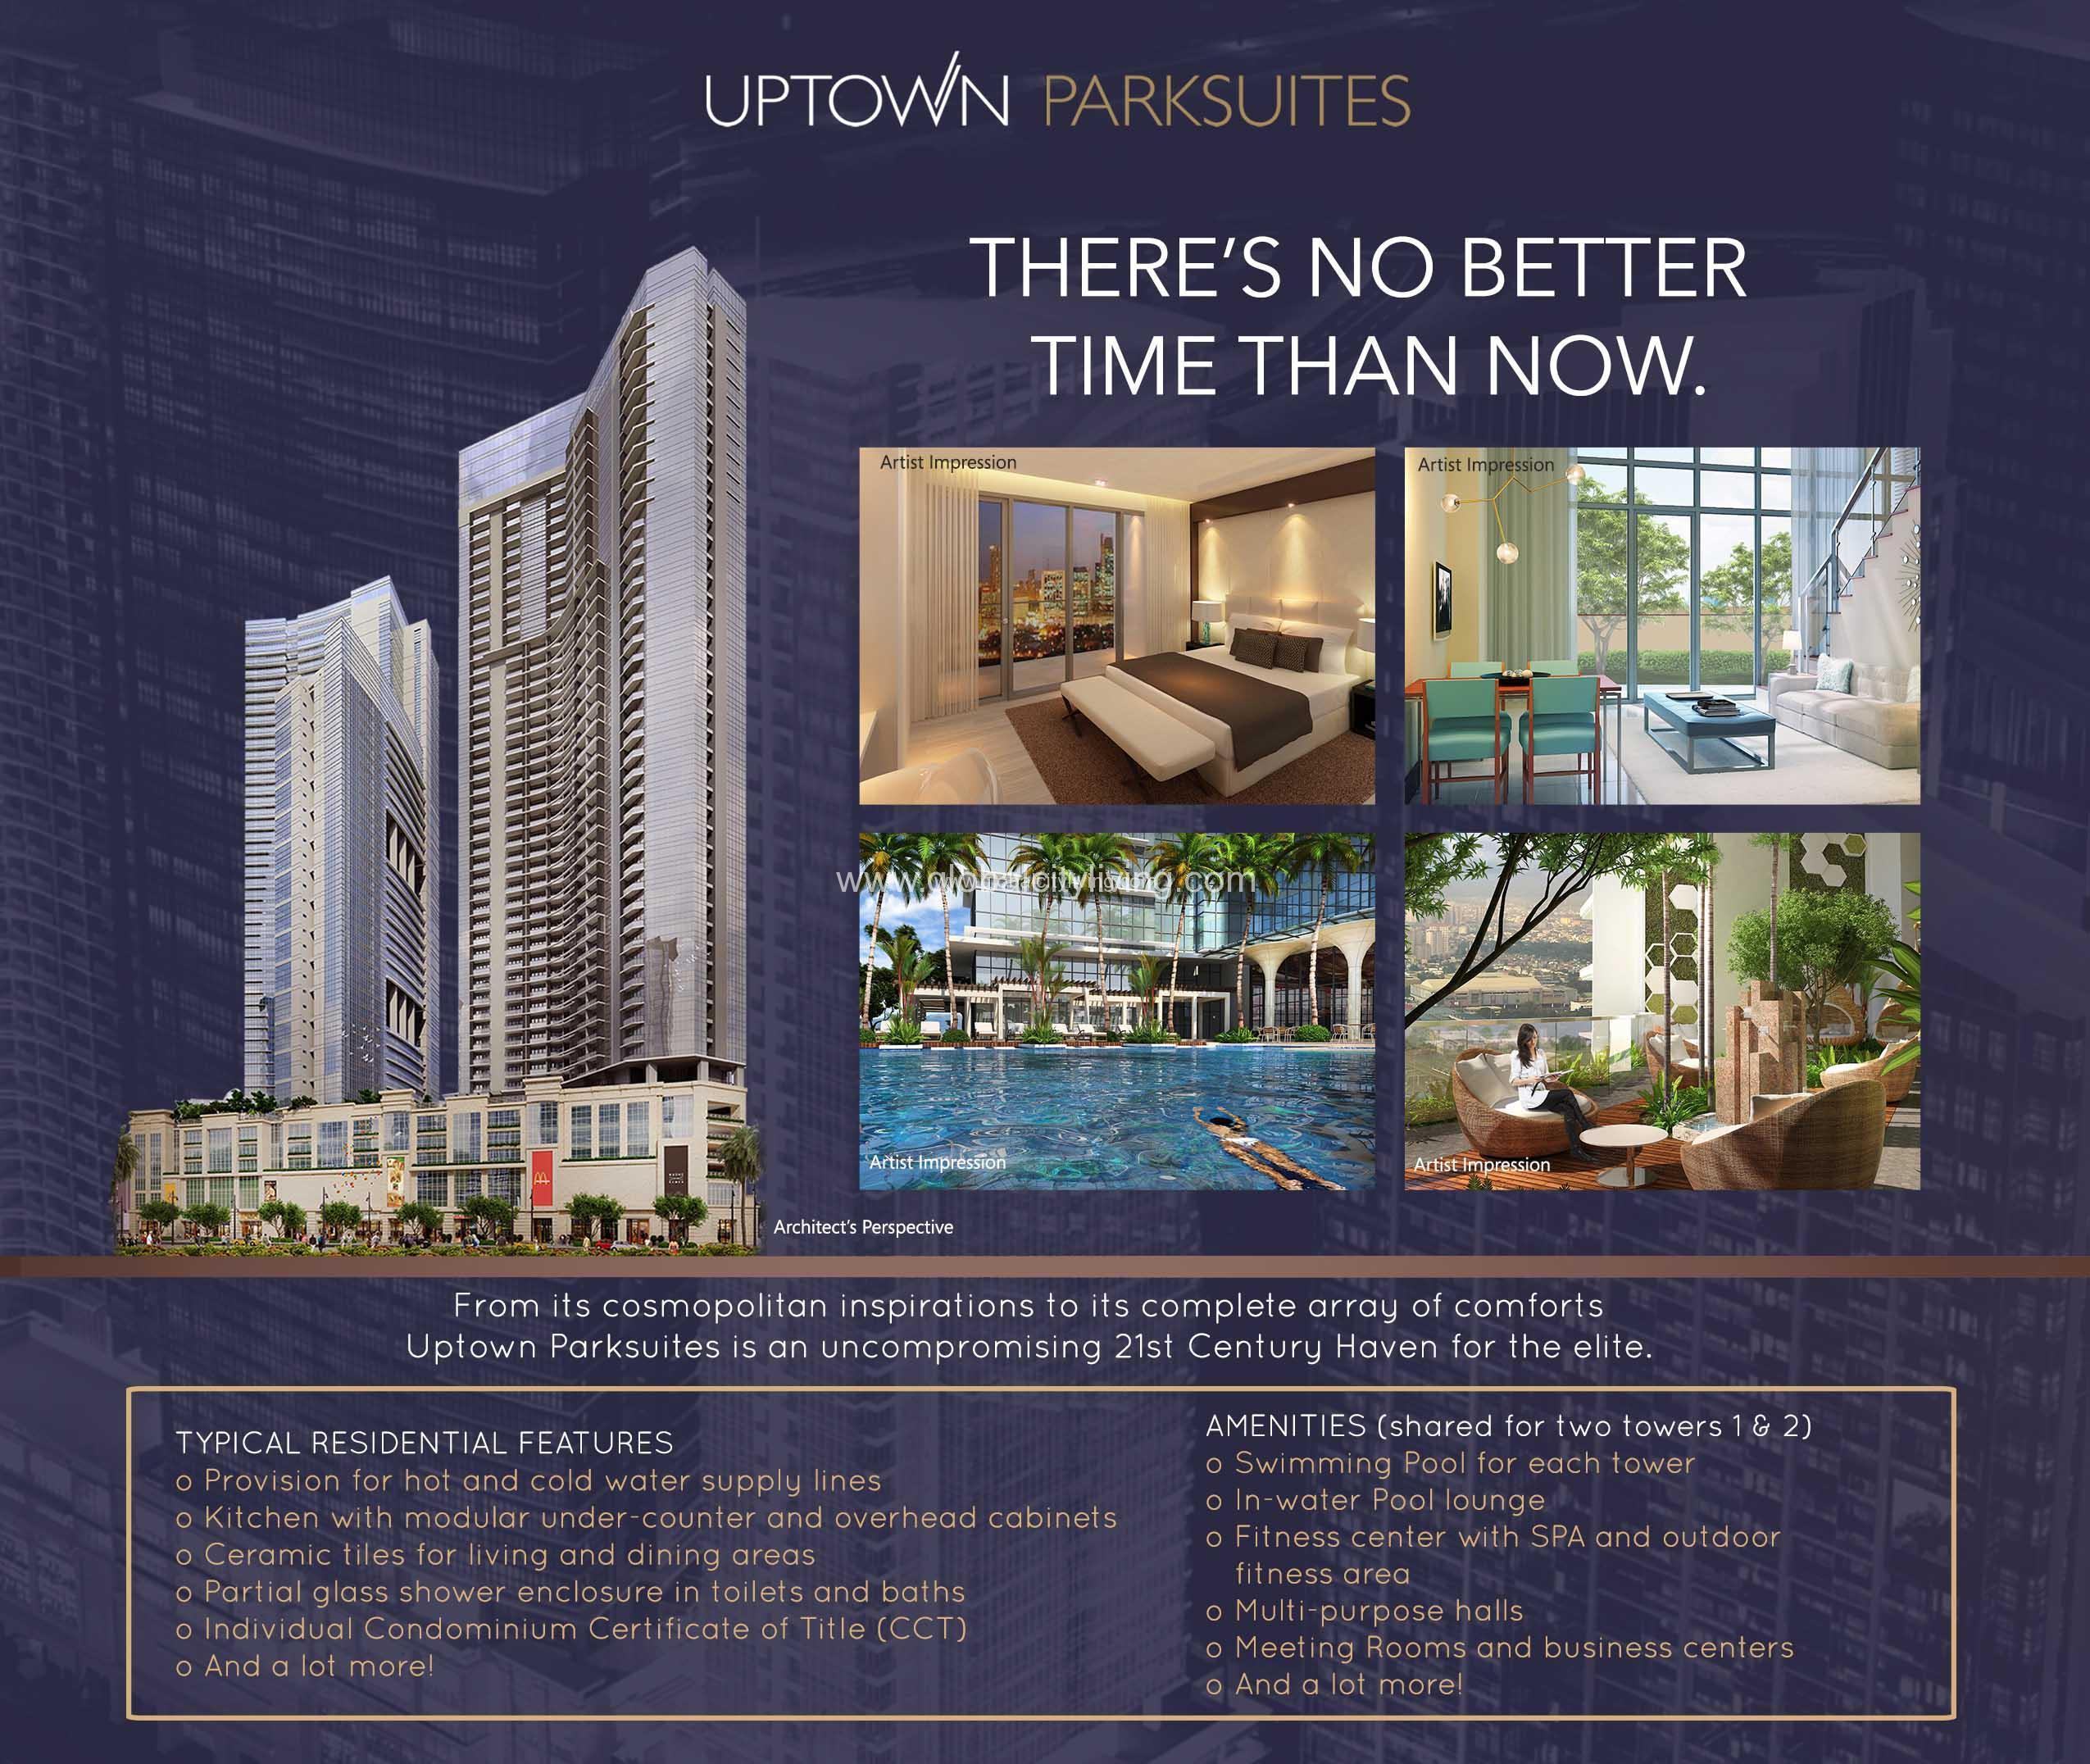 Condo Rentals In: Uptown Parksuites In Global City